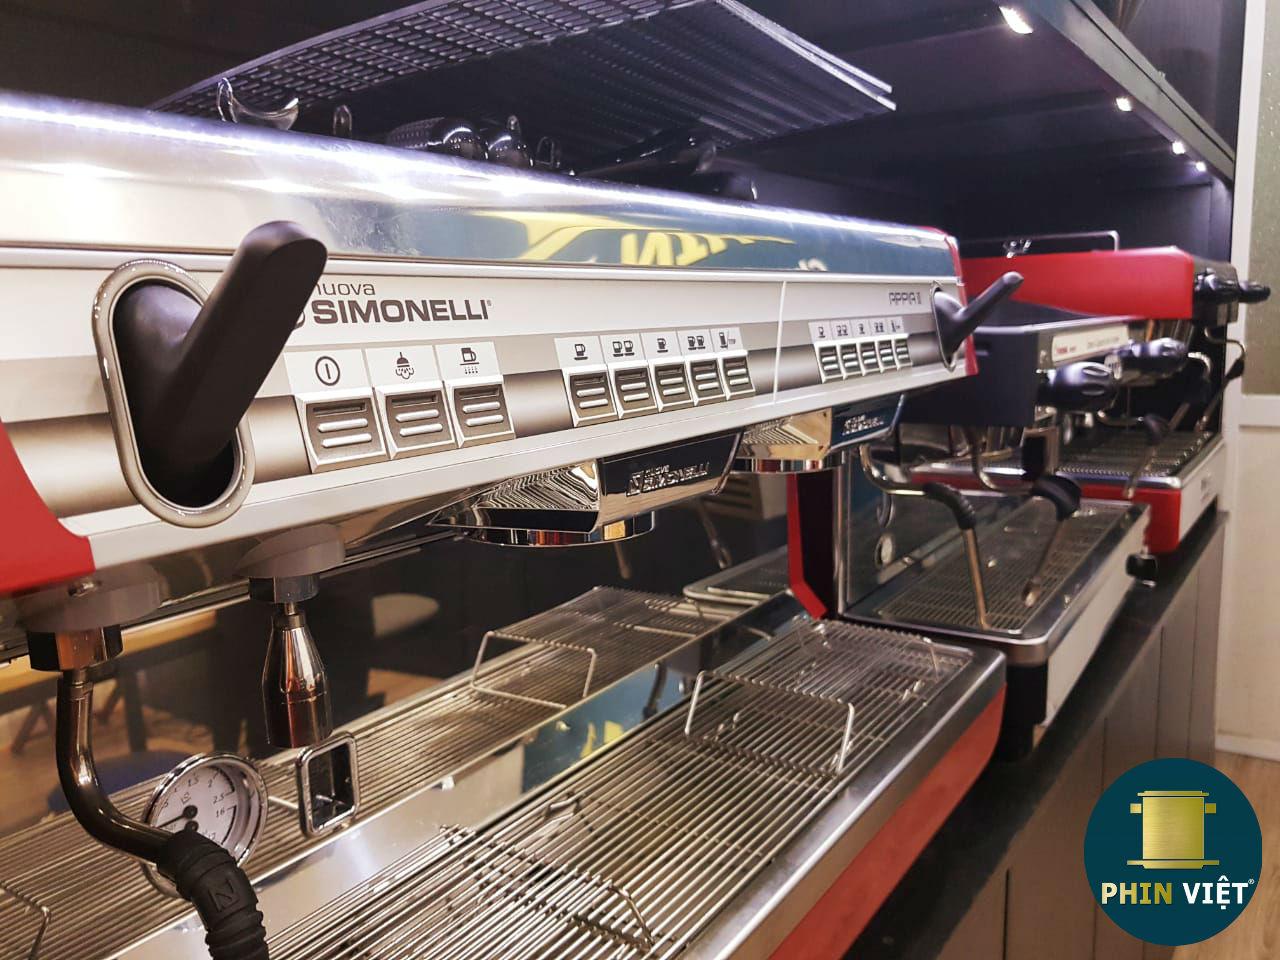 Máy pha cà phê Nuova Simonelli Appia 2 group